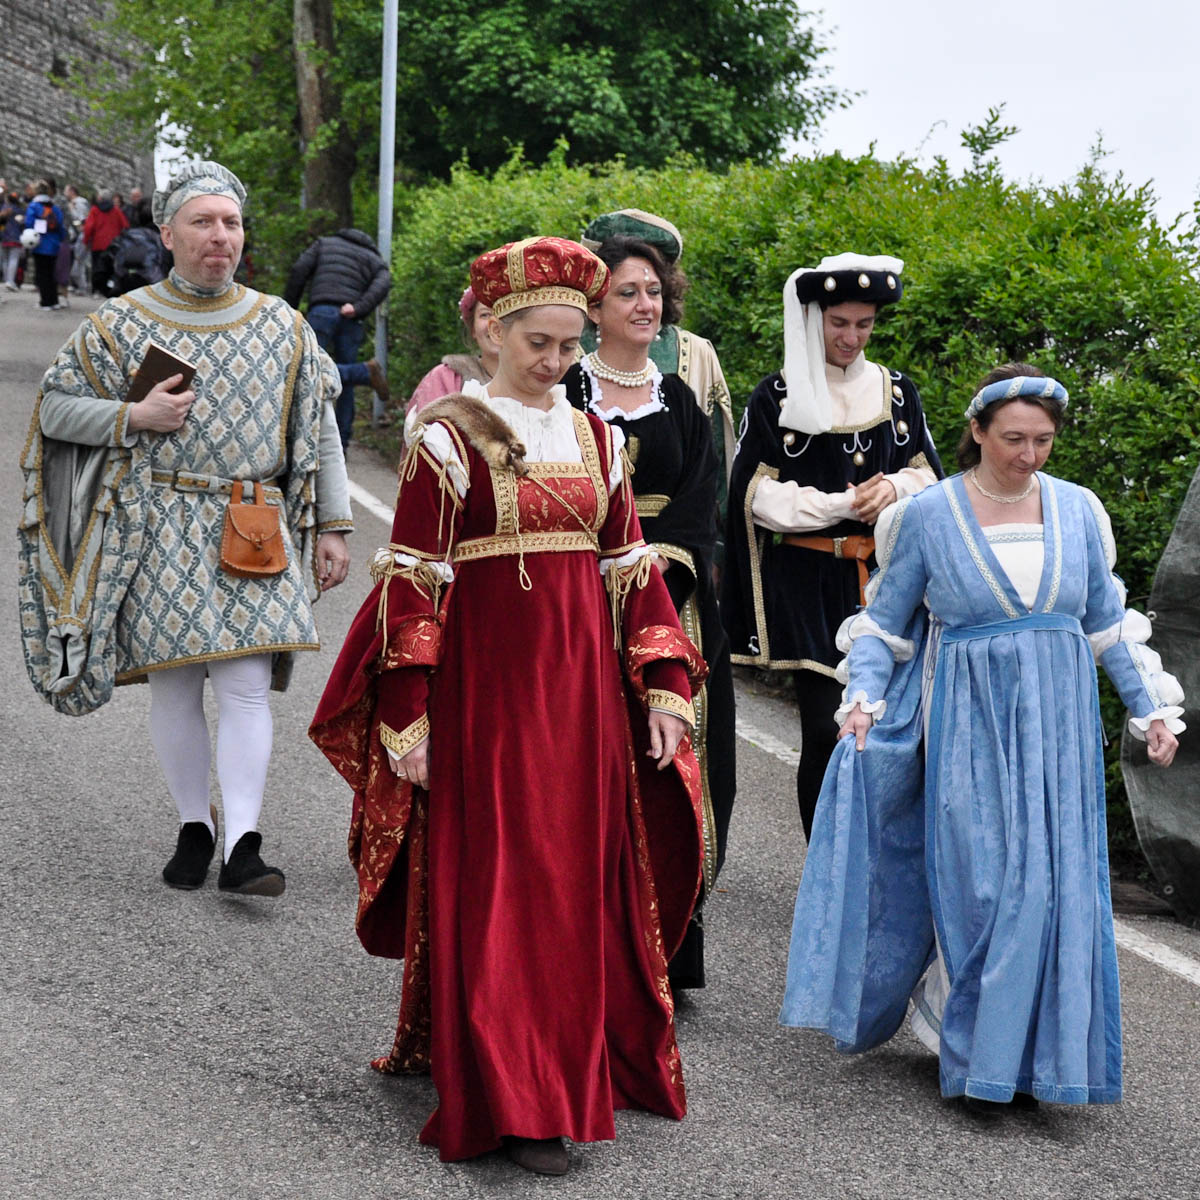 Reenactors dressed in period costumes, Romeo and Juliet Festival - Faida, Montecchio Maggiore, Veneto, Italy